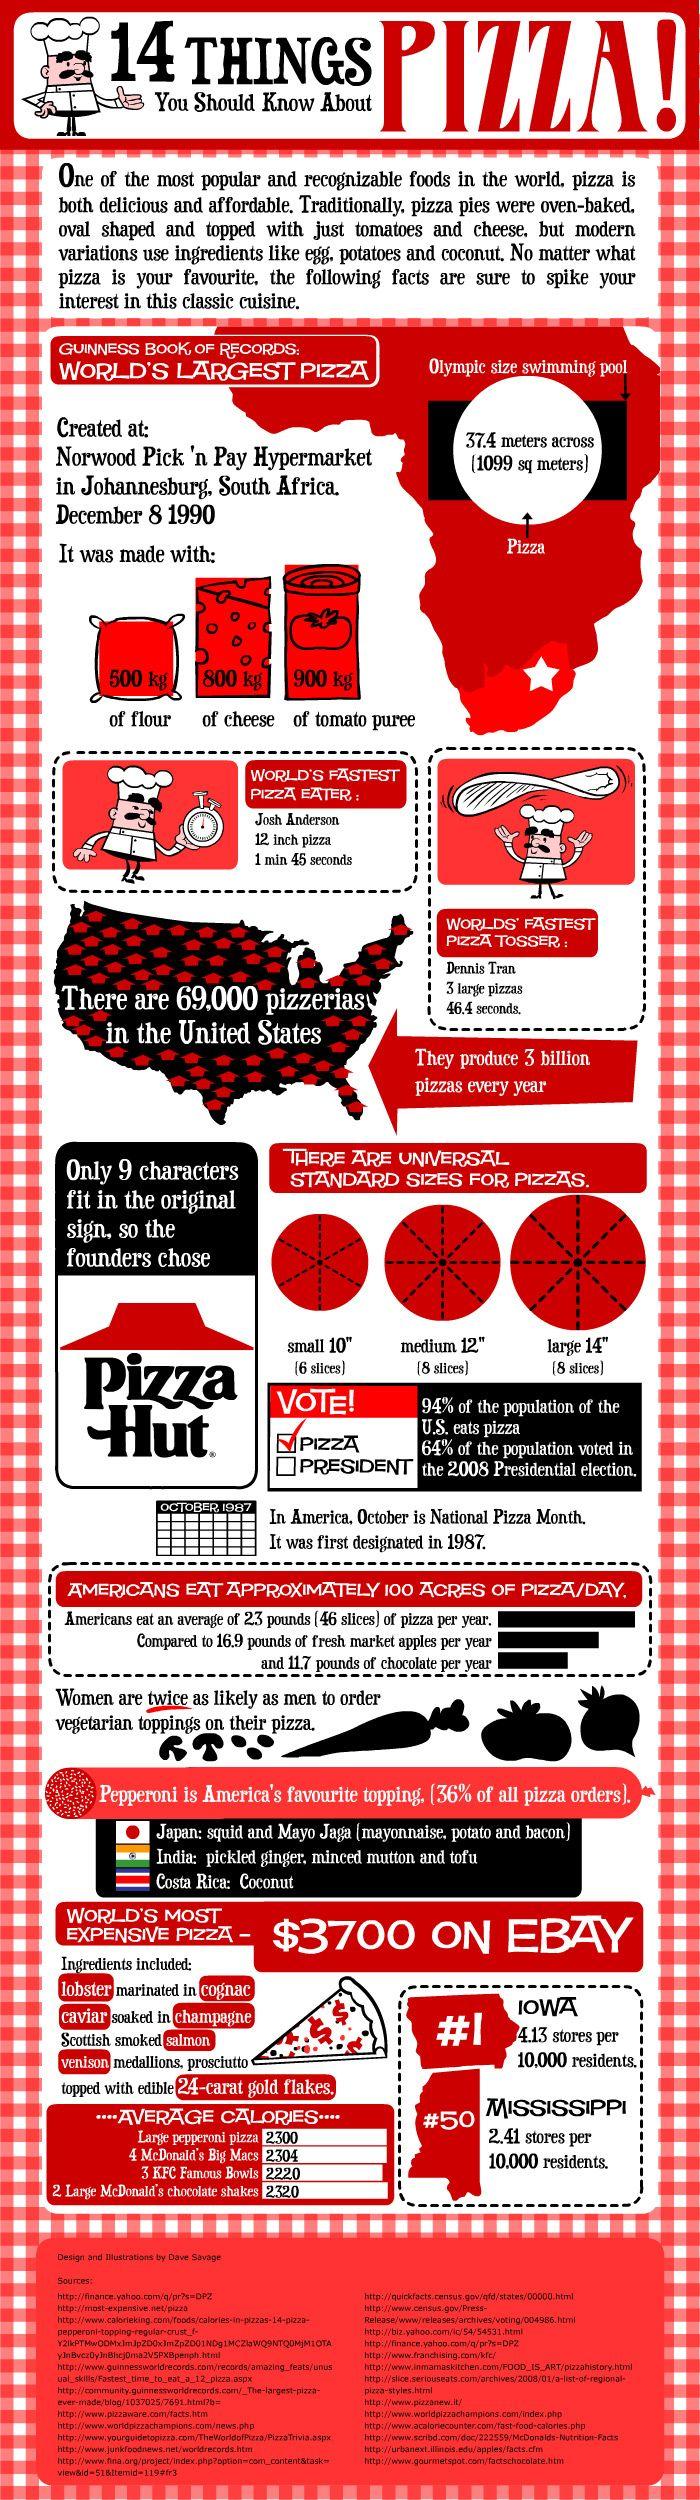 38 Catchy Pizza Restaurant Names